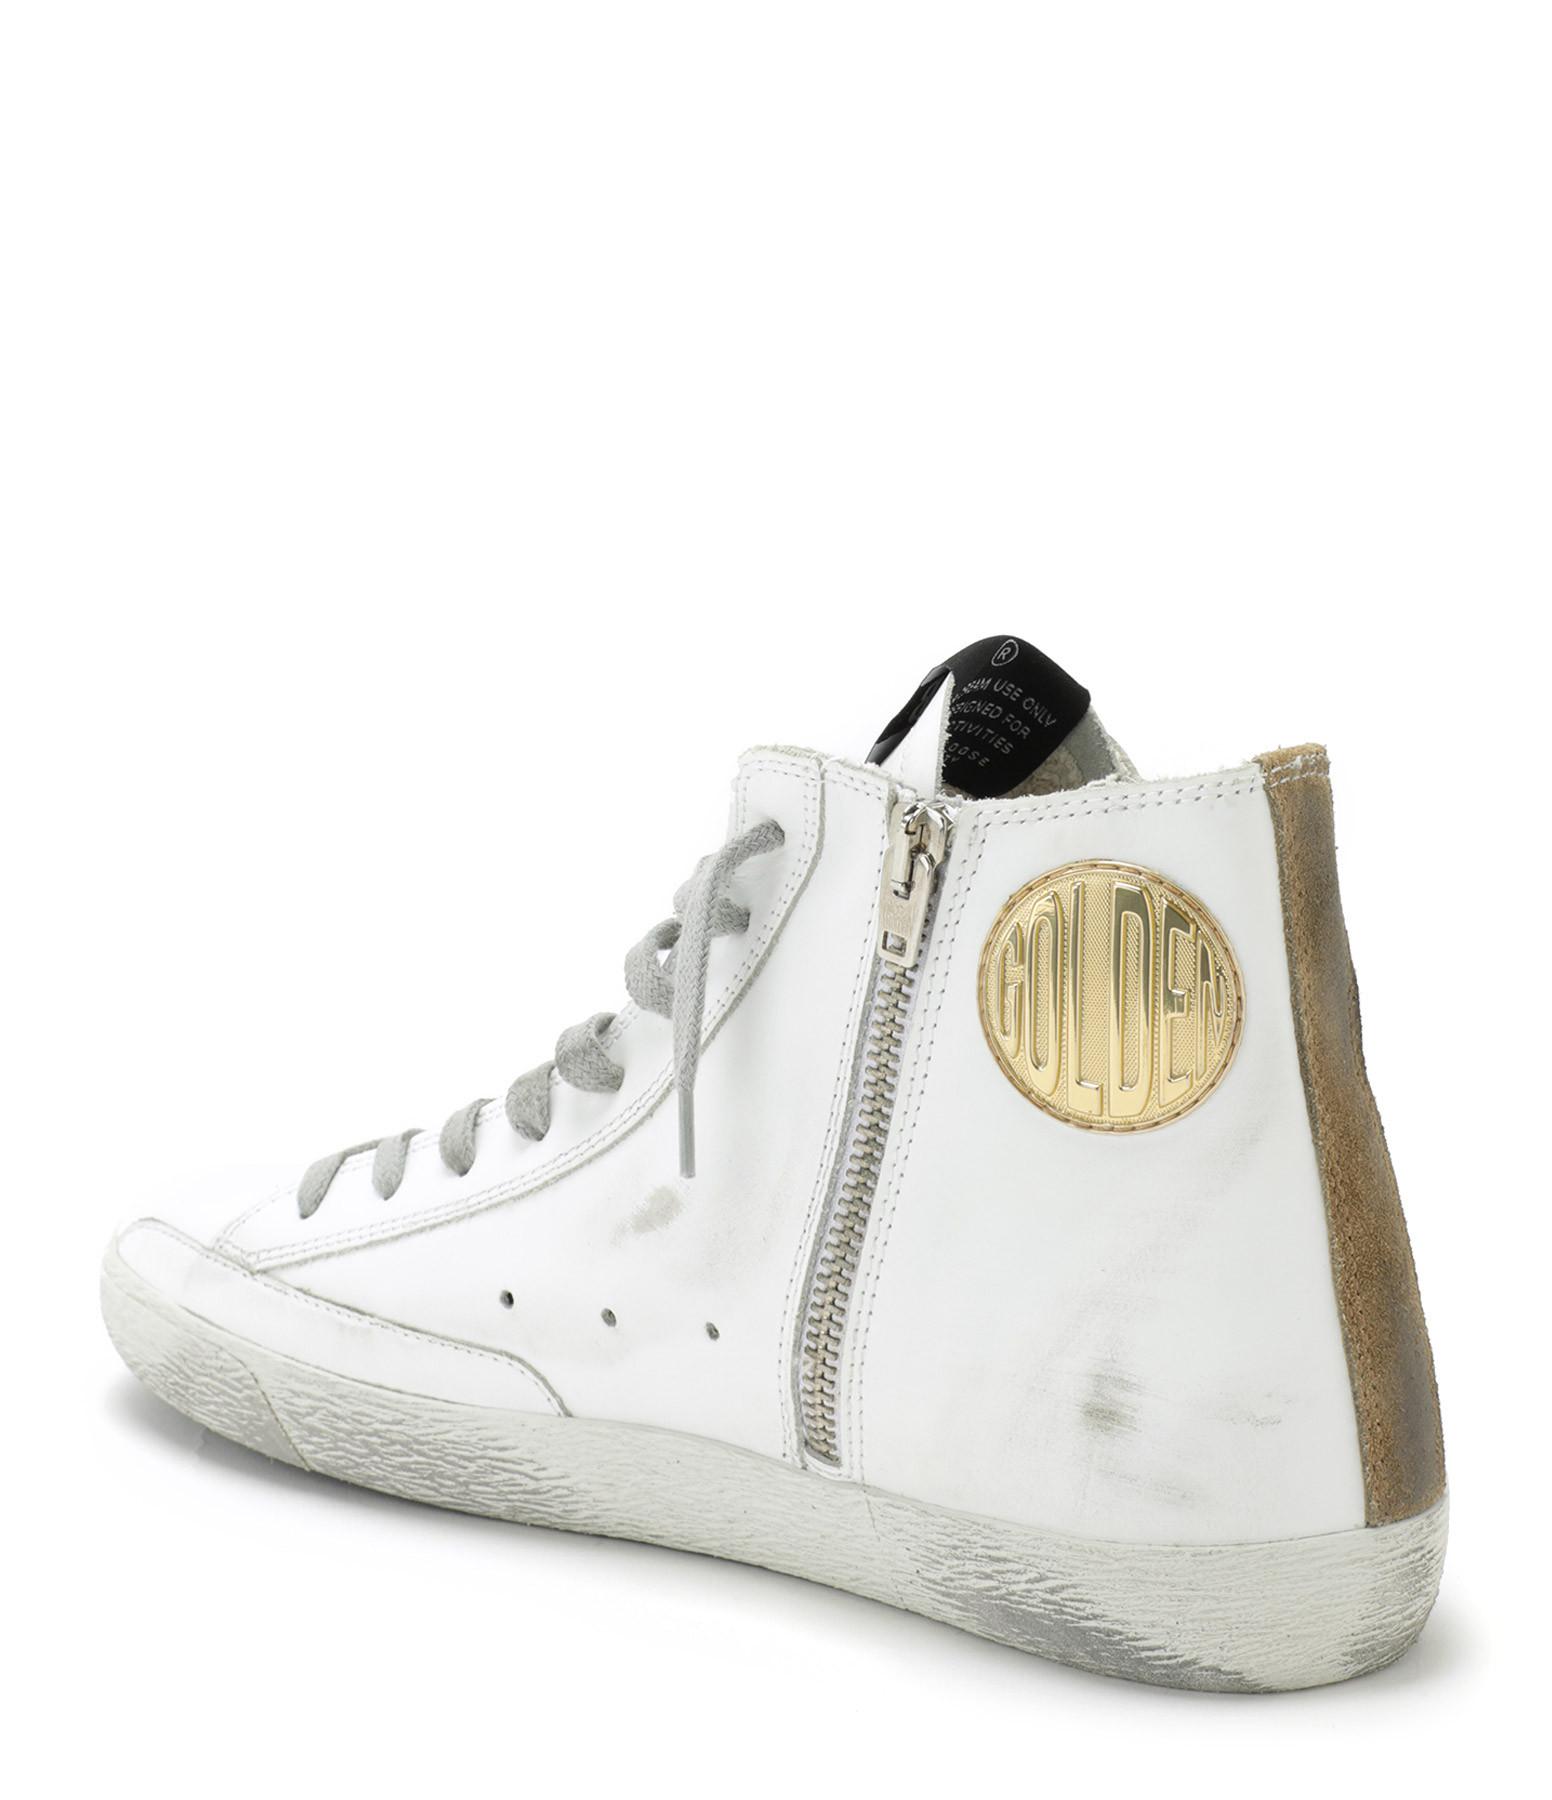 GOLDEN GOOSE - Baskets Francy Cuir Suédé Glitter Tabac Aquamarine